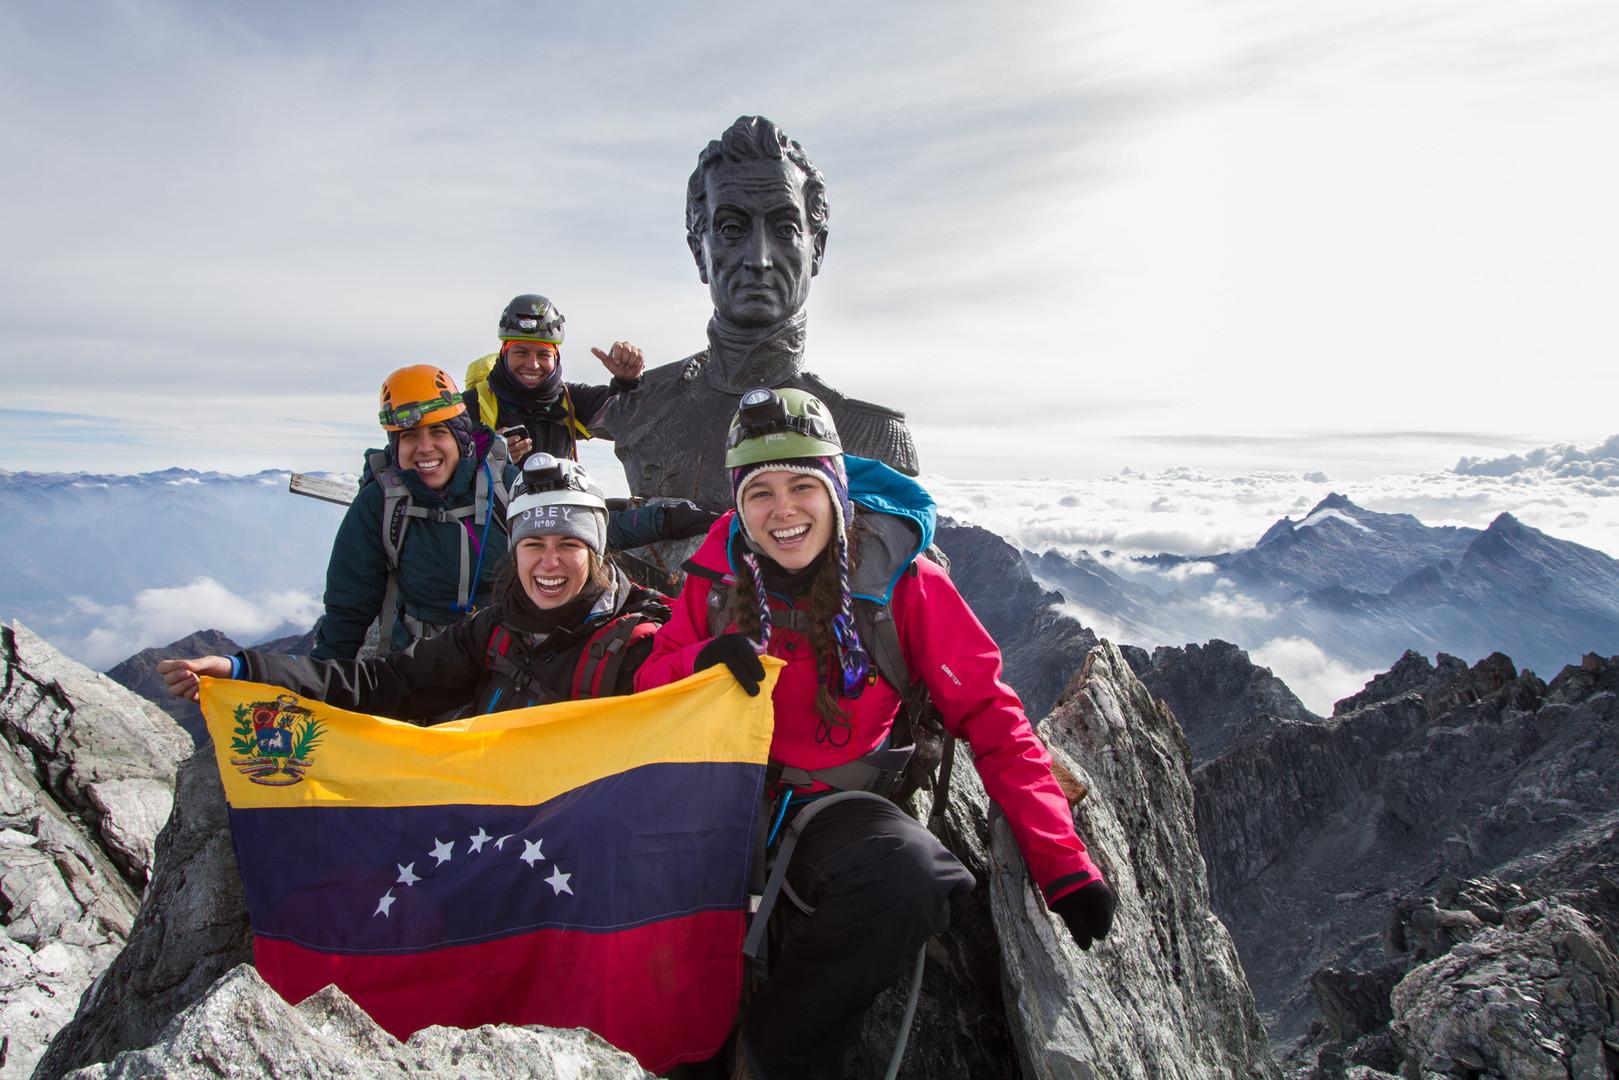 Merida_PicoBolivar_hiker_trekking_mujer_